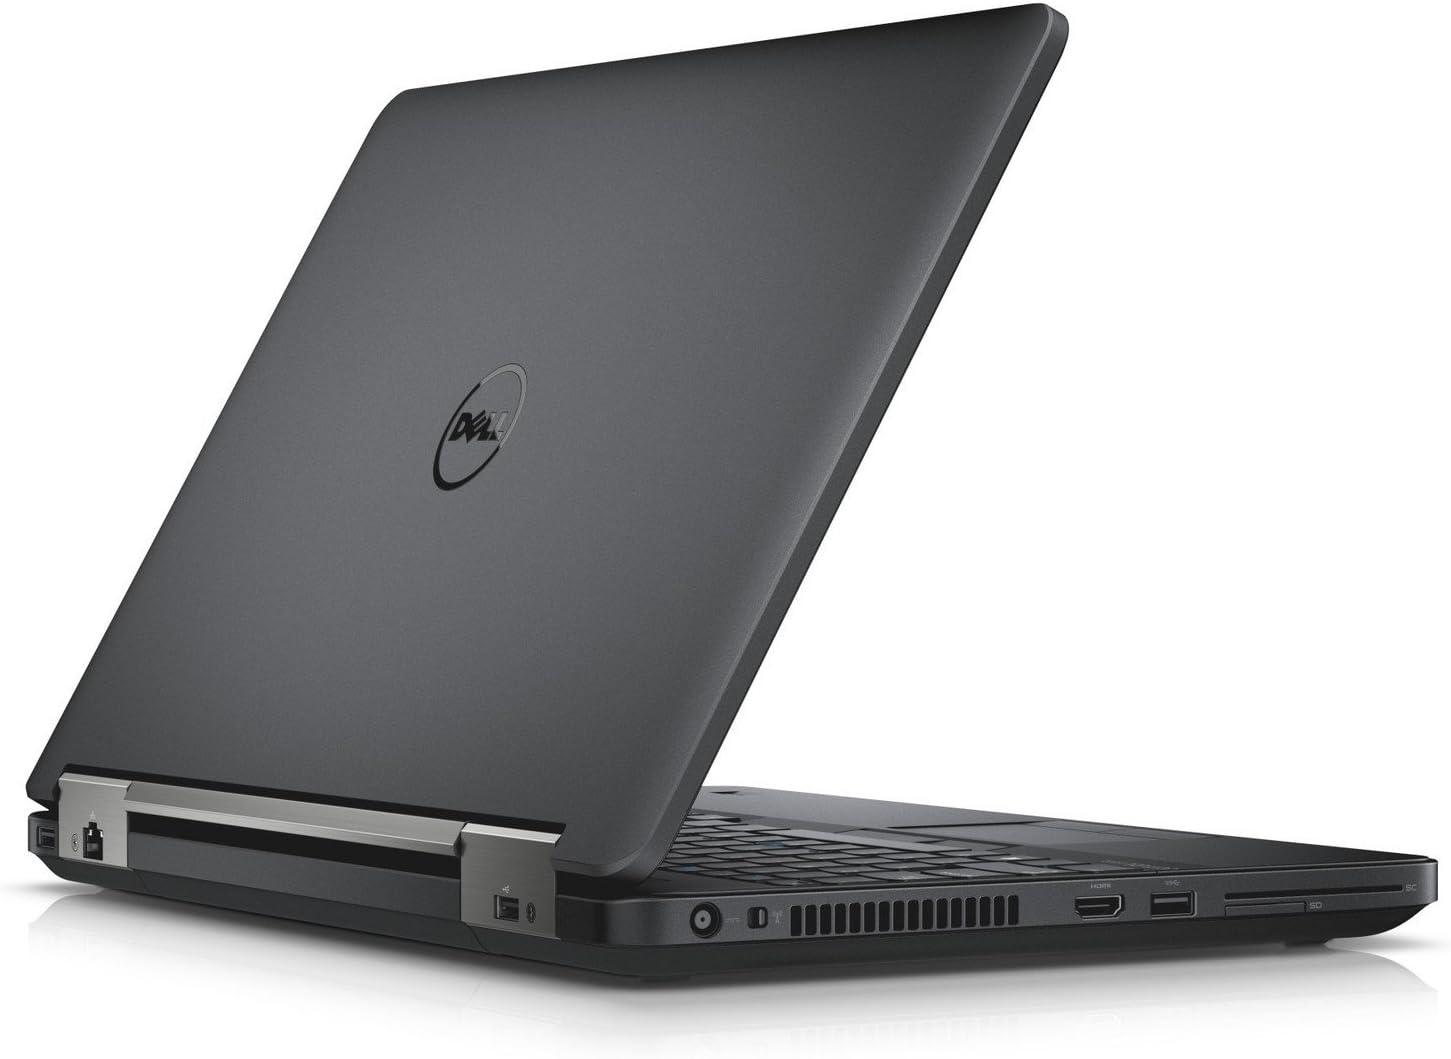 128GB SSD Intel i5-4300U-1.9 Ghz DVDRW,1 year warranty -Refurbished Win 10 pro Dell Latitude E5540 8GB memory 15 Screen